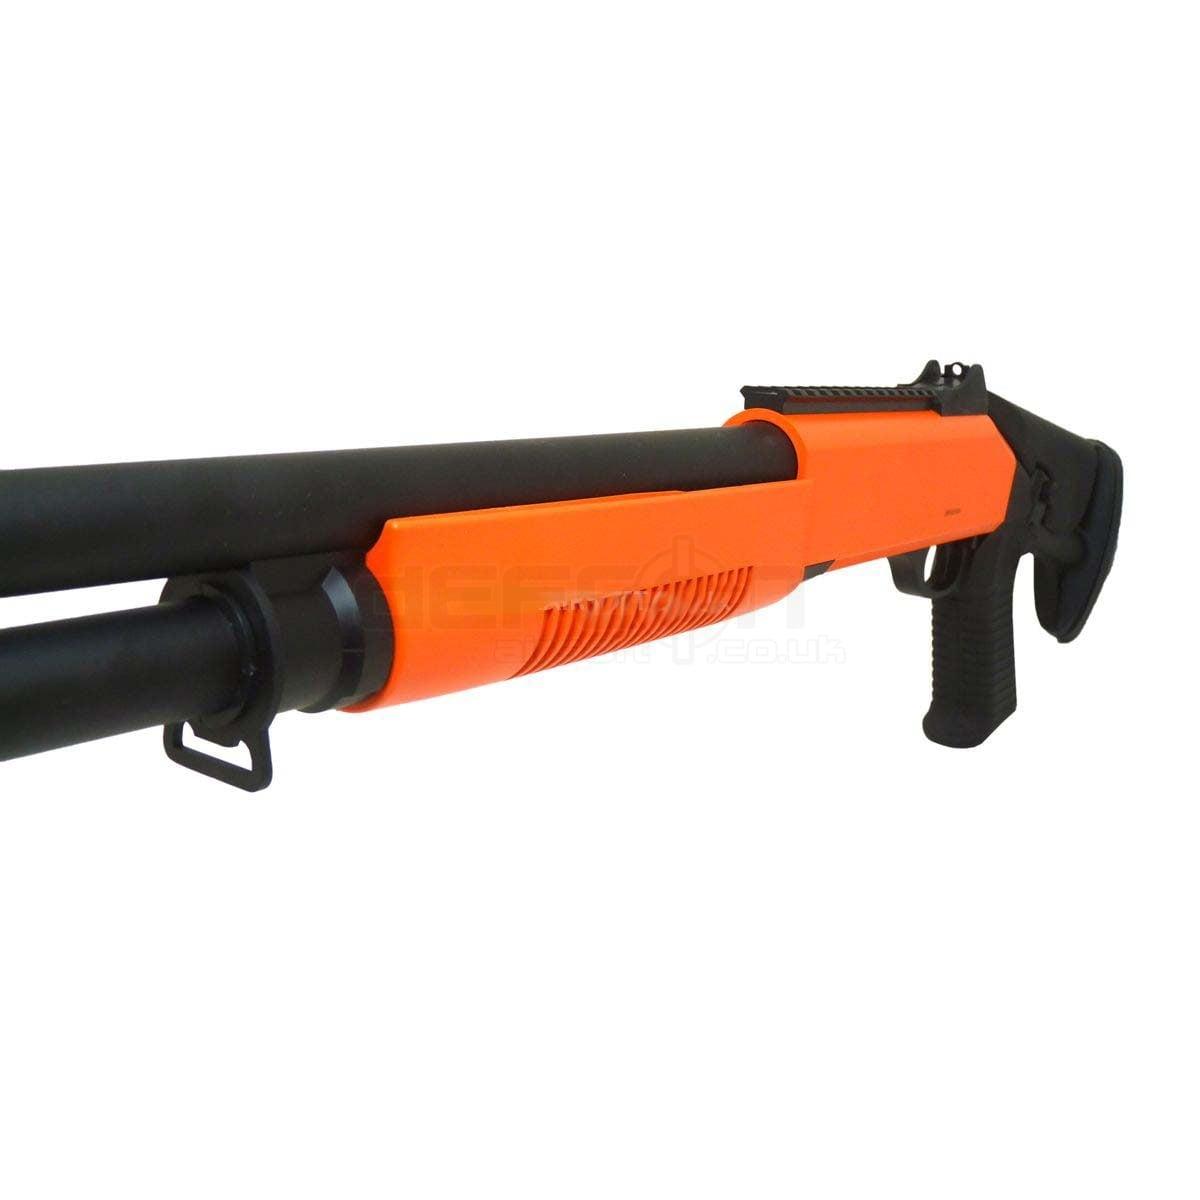 Tri-Shot M56DL Pump Action Shotgun BB Gun » DEFCON AIRSOFT